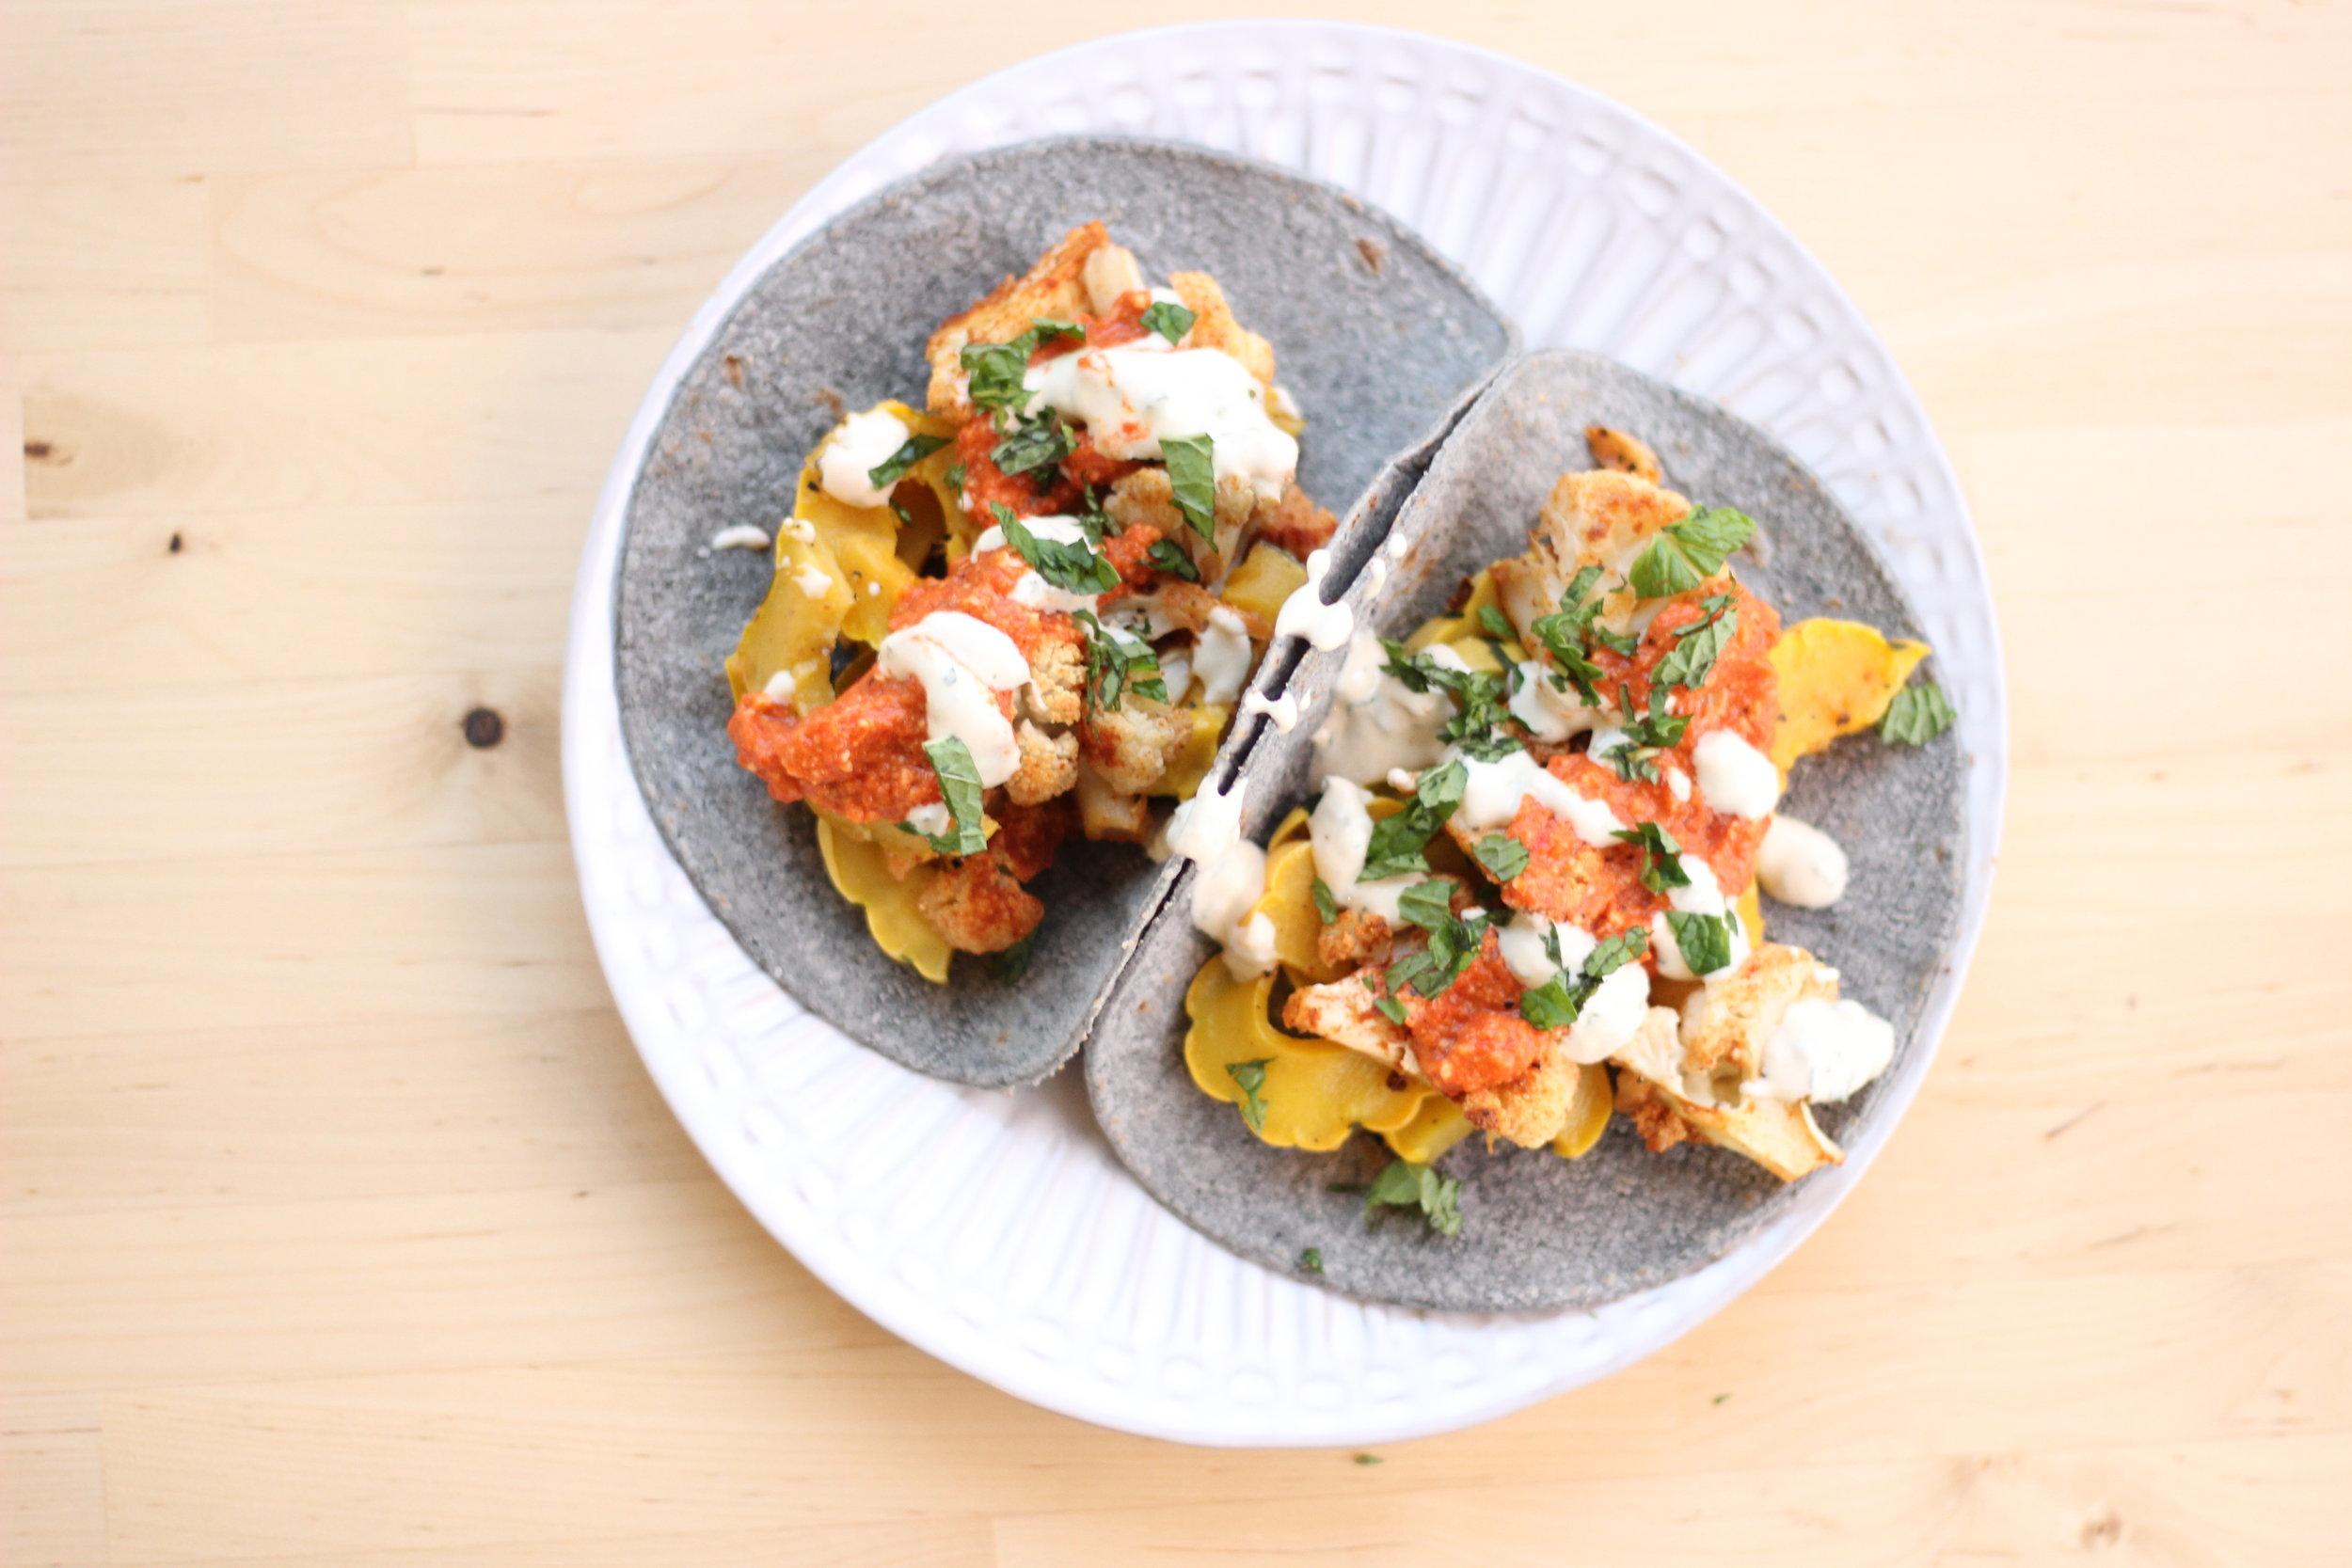 Cauliflower tacos romesco sauce  plated2.jpg